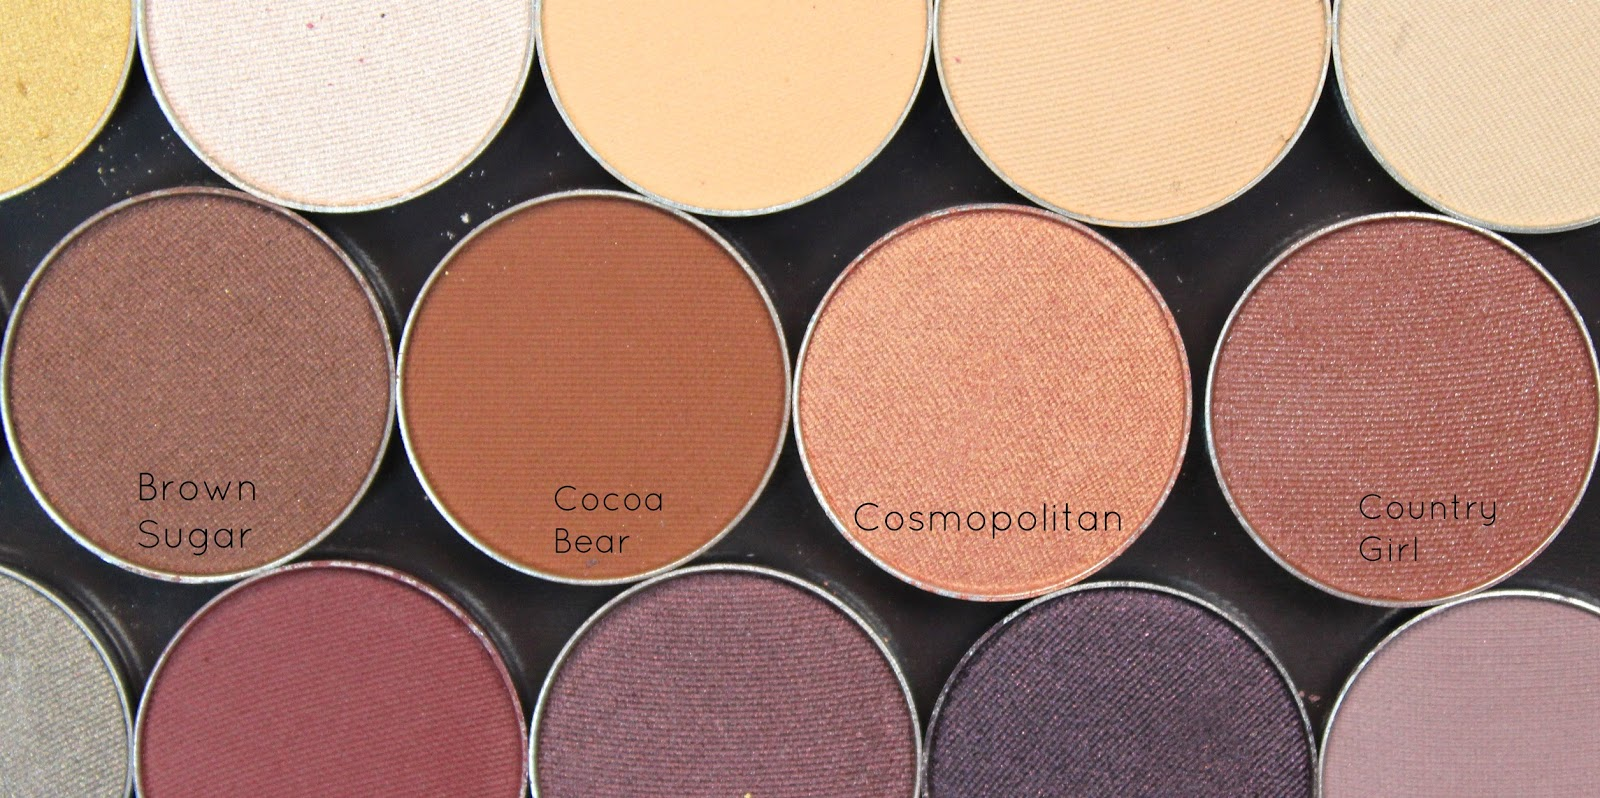 makeup geek cosmopolitan - photo #39